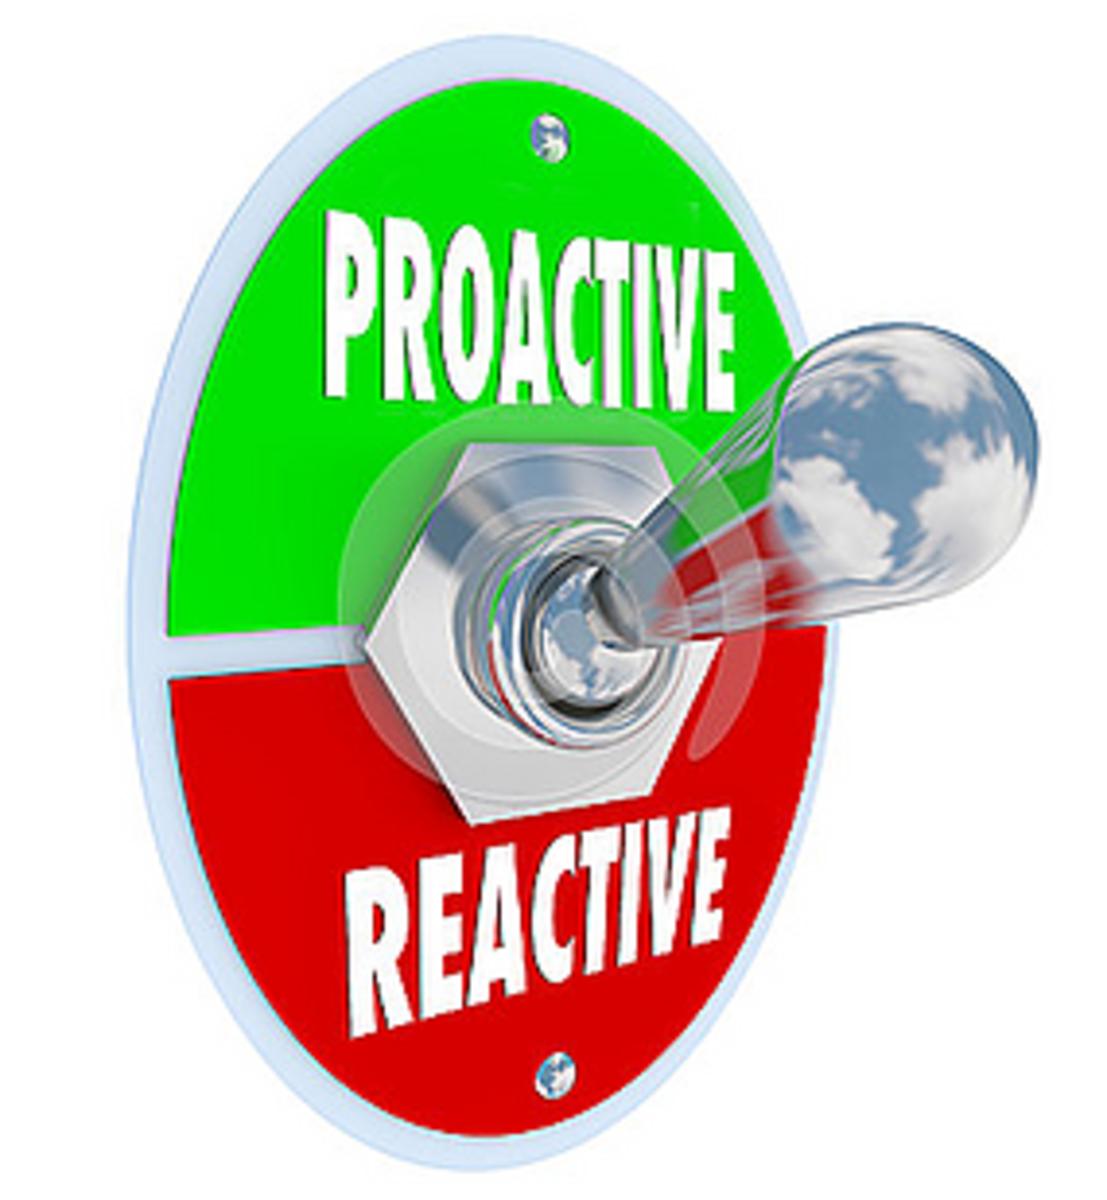 Proactive and Reactive Methods